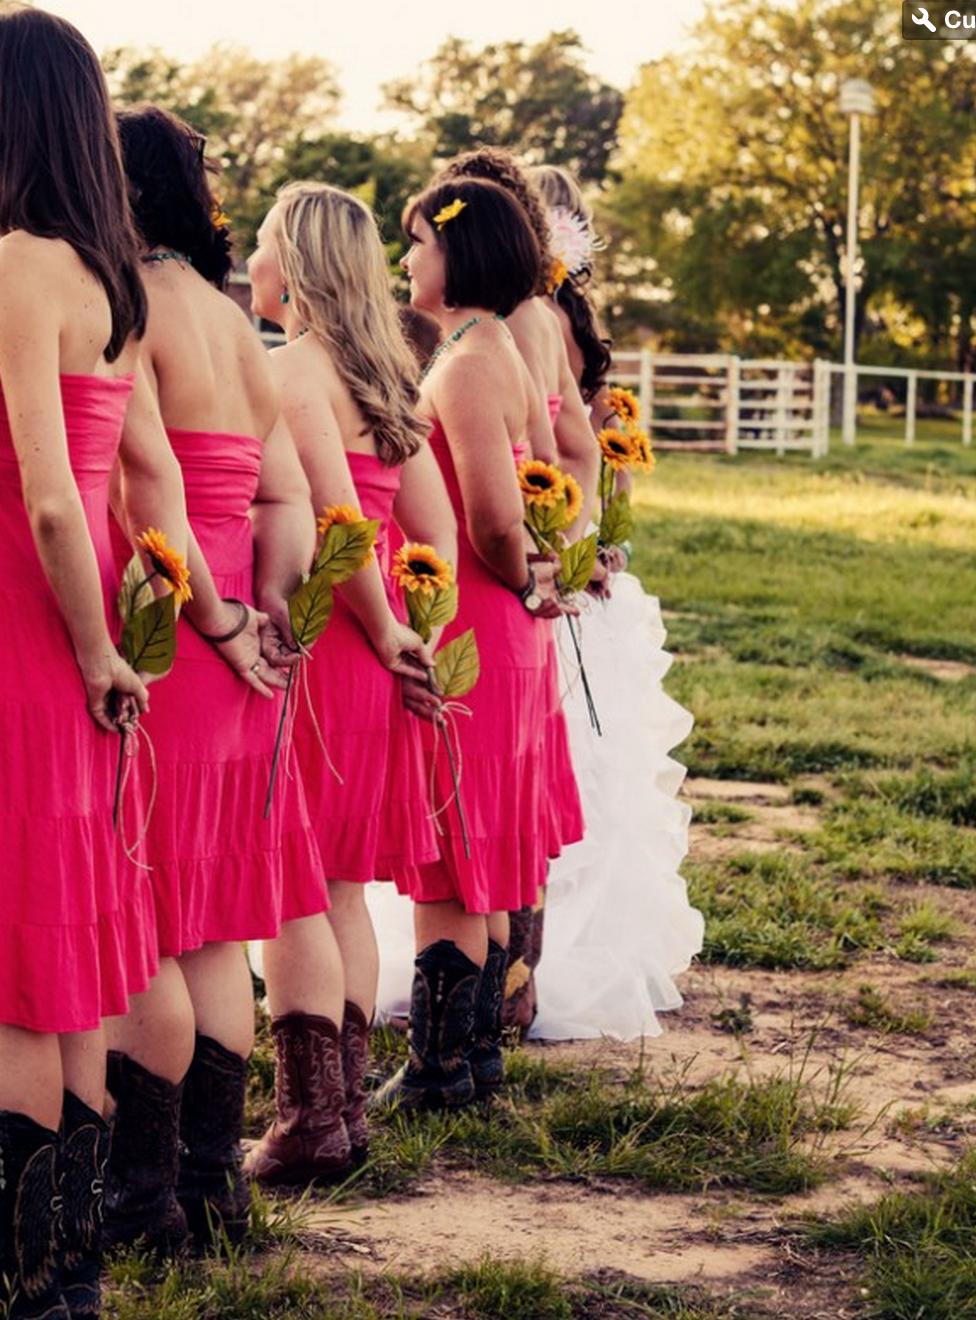 Purple camo wedding dresses  barn wedding boots sunflower  Cowgirl Wedding  Pinterest  Cowgirl